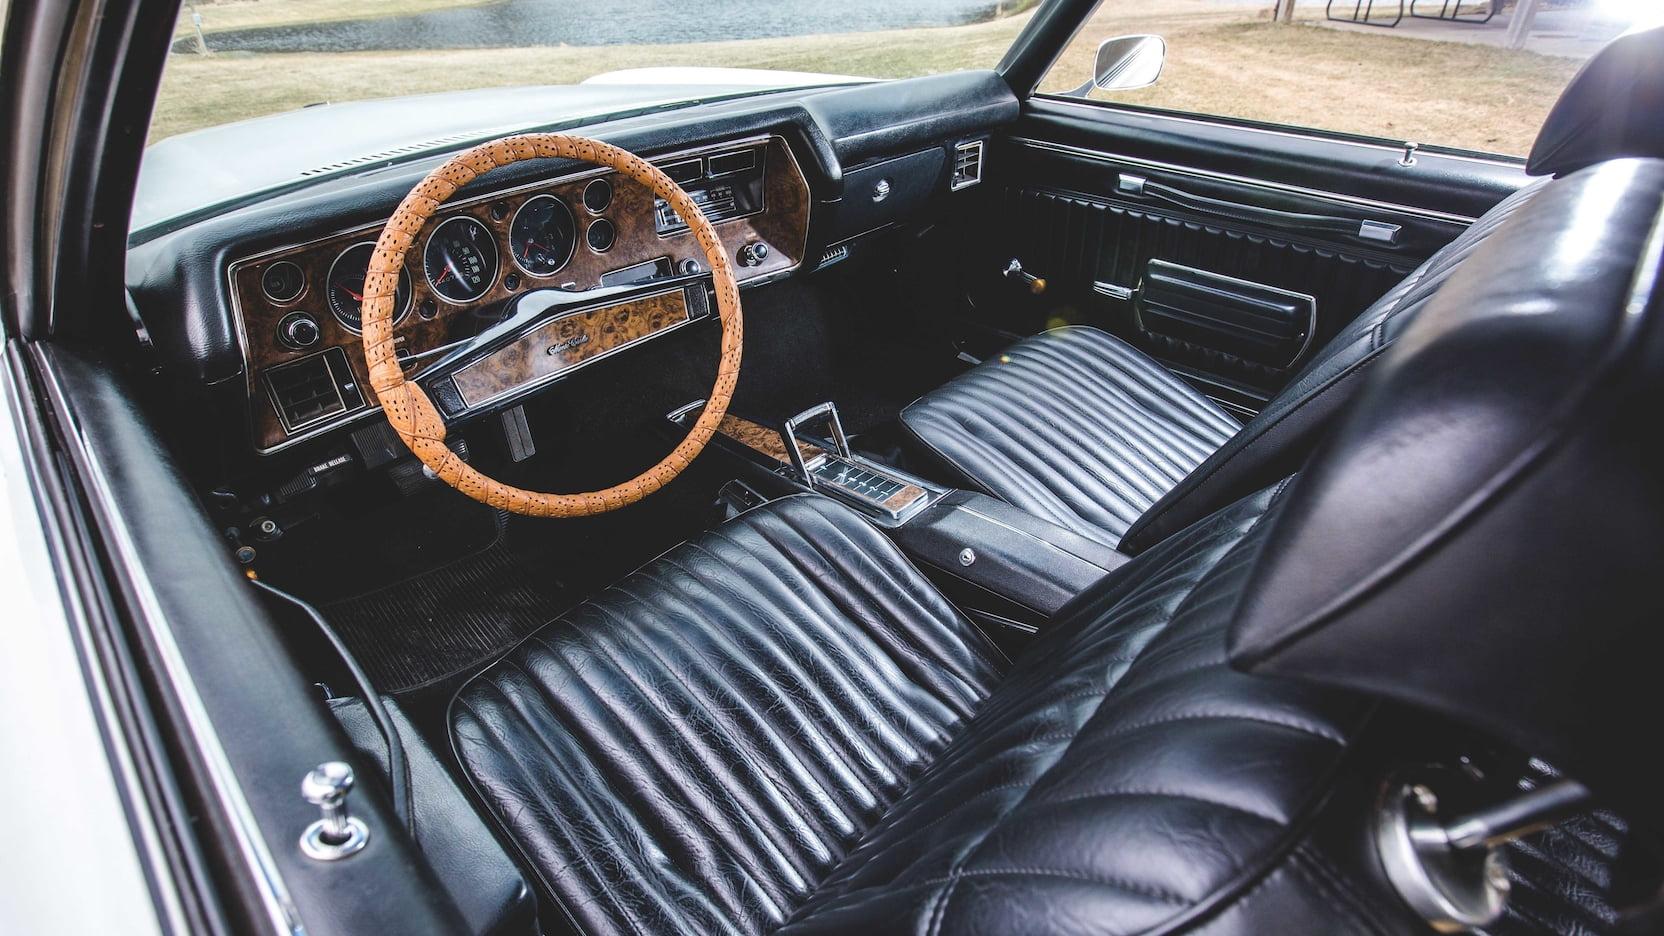 1970 Chevrolet Monte Carlo SS interior